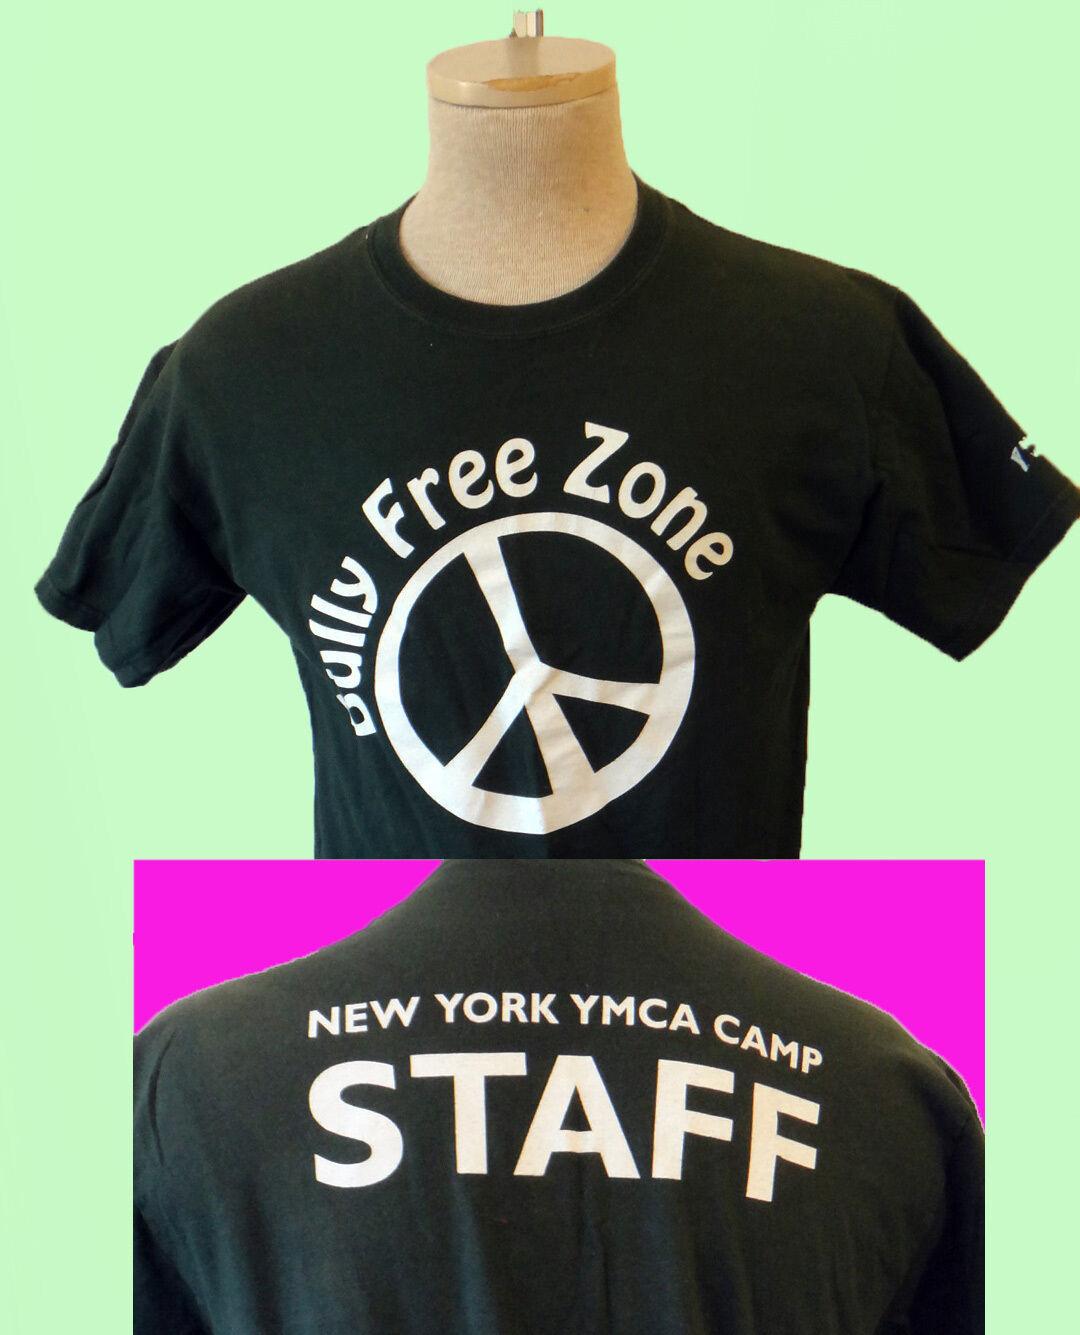 NO BULLY free zone lifeguard new york city ymca camp medium peace sign staff vtg